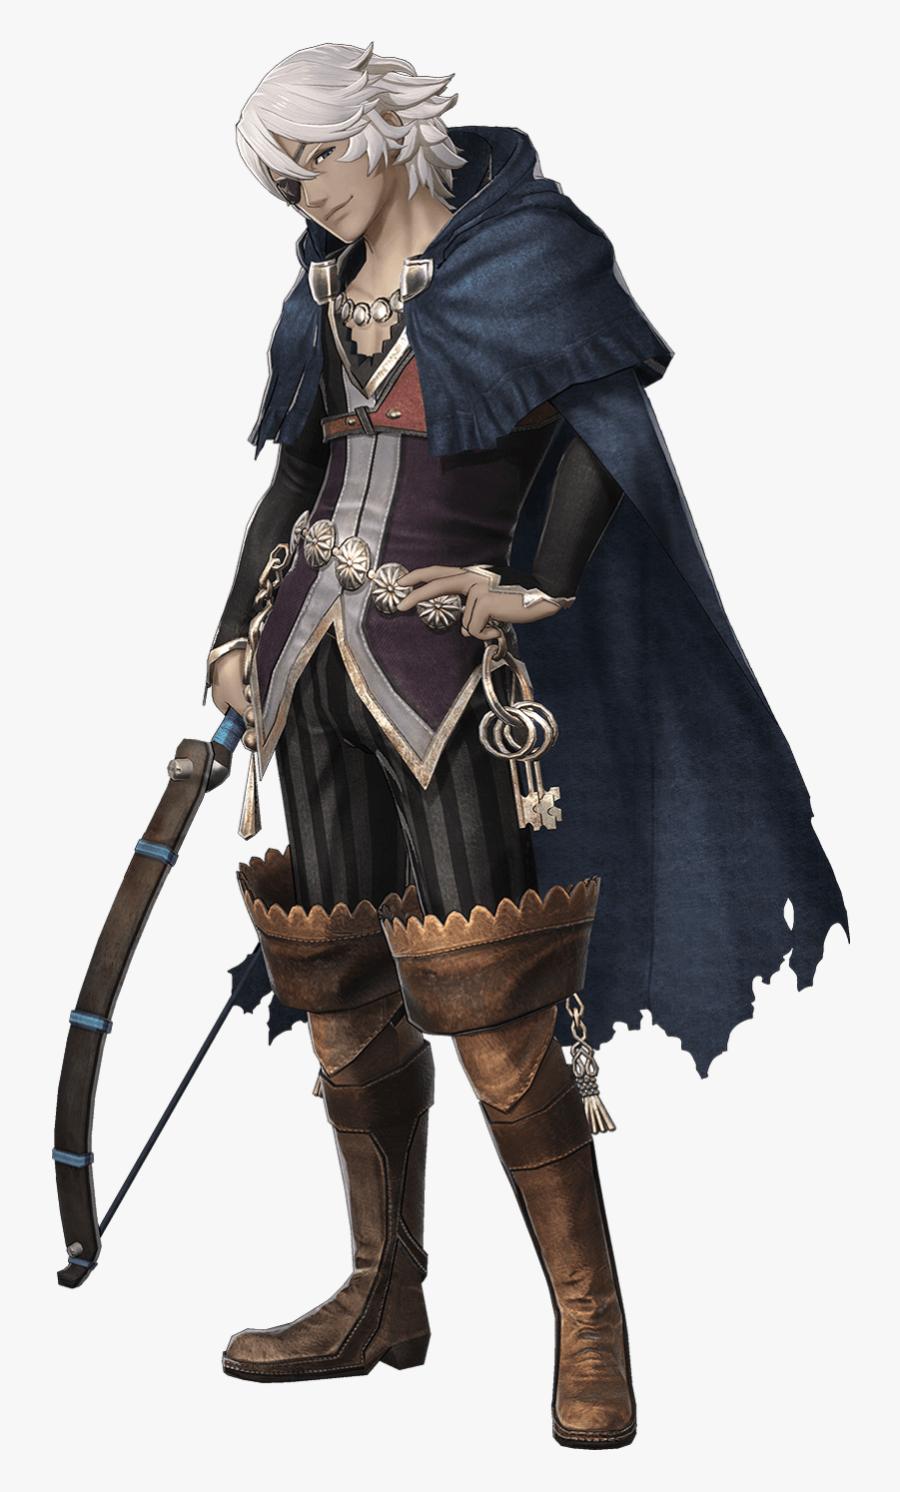 Niles Fire Emblem Warriors, Transparent Clipart